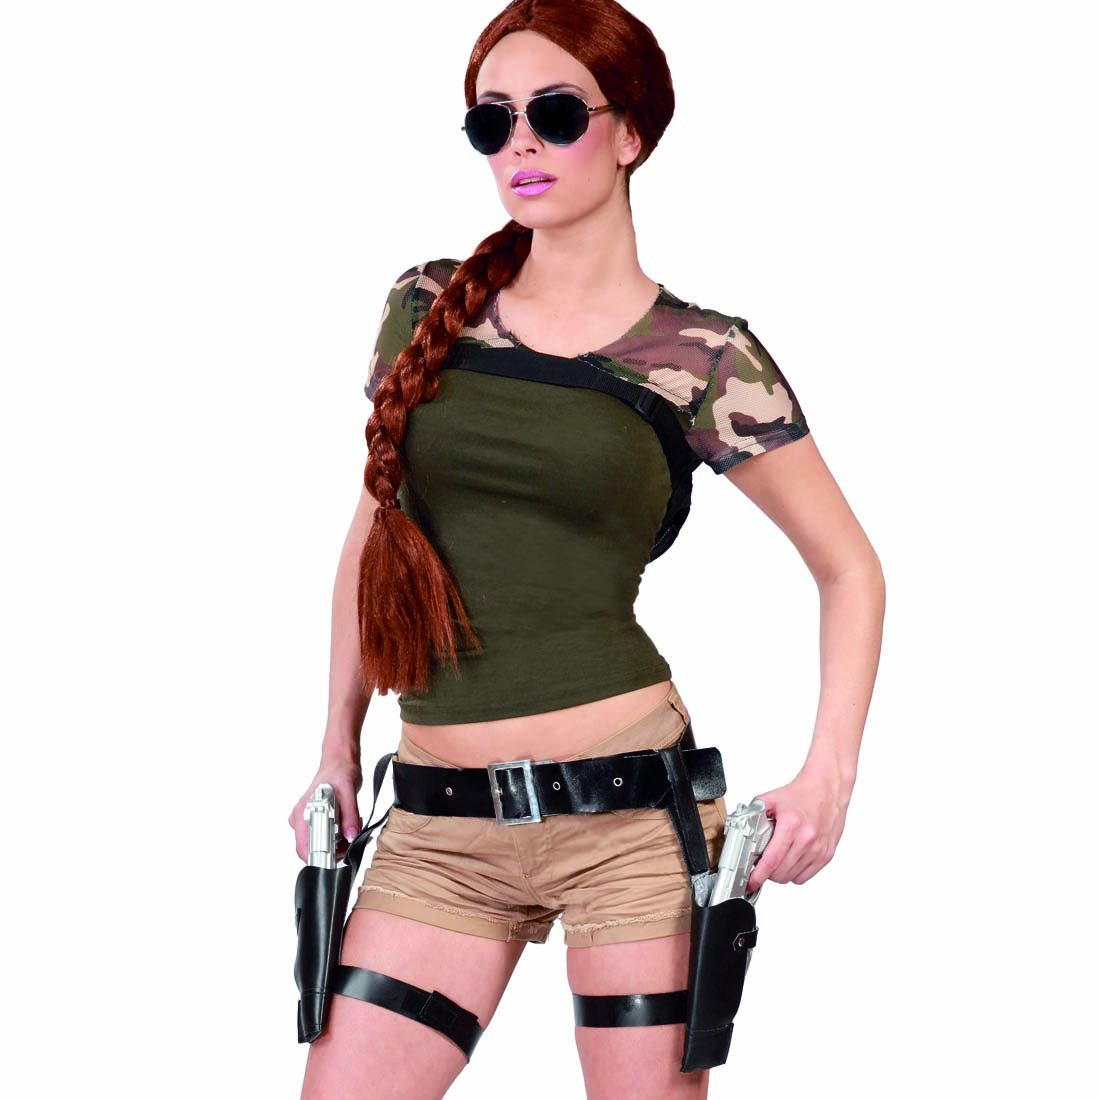 Net Toys Double Gun Holster Lara Croft Holster With Pistols